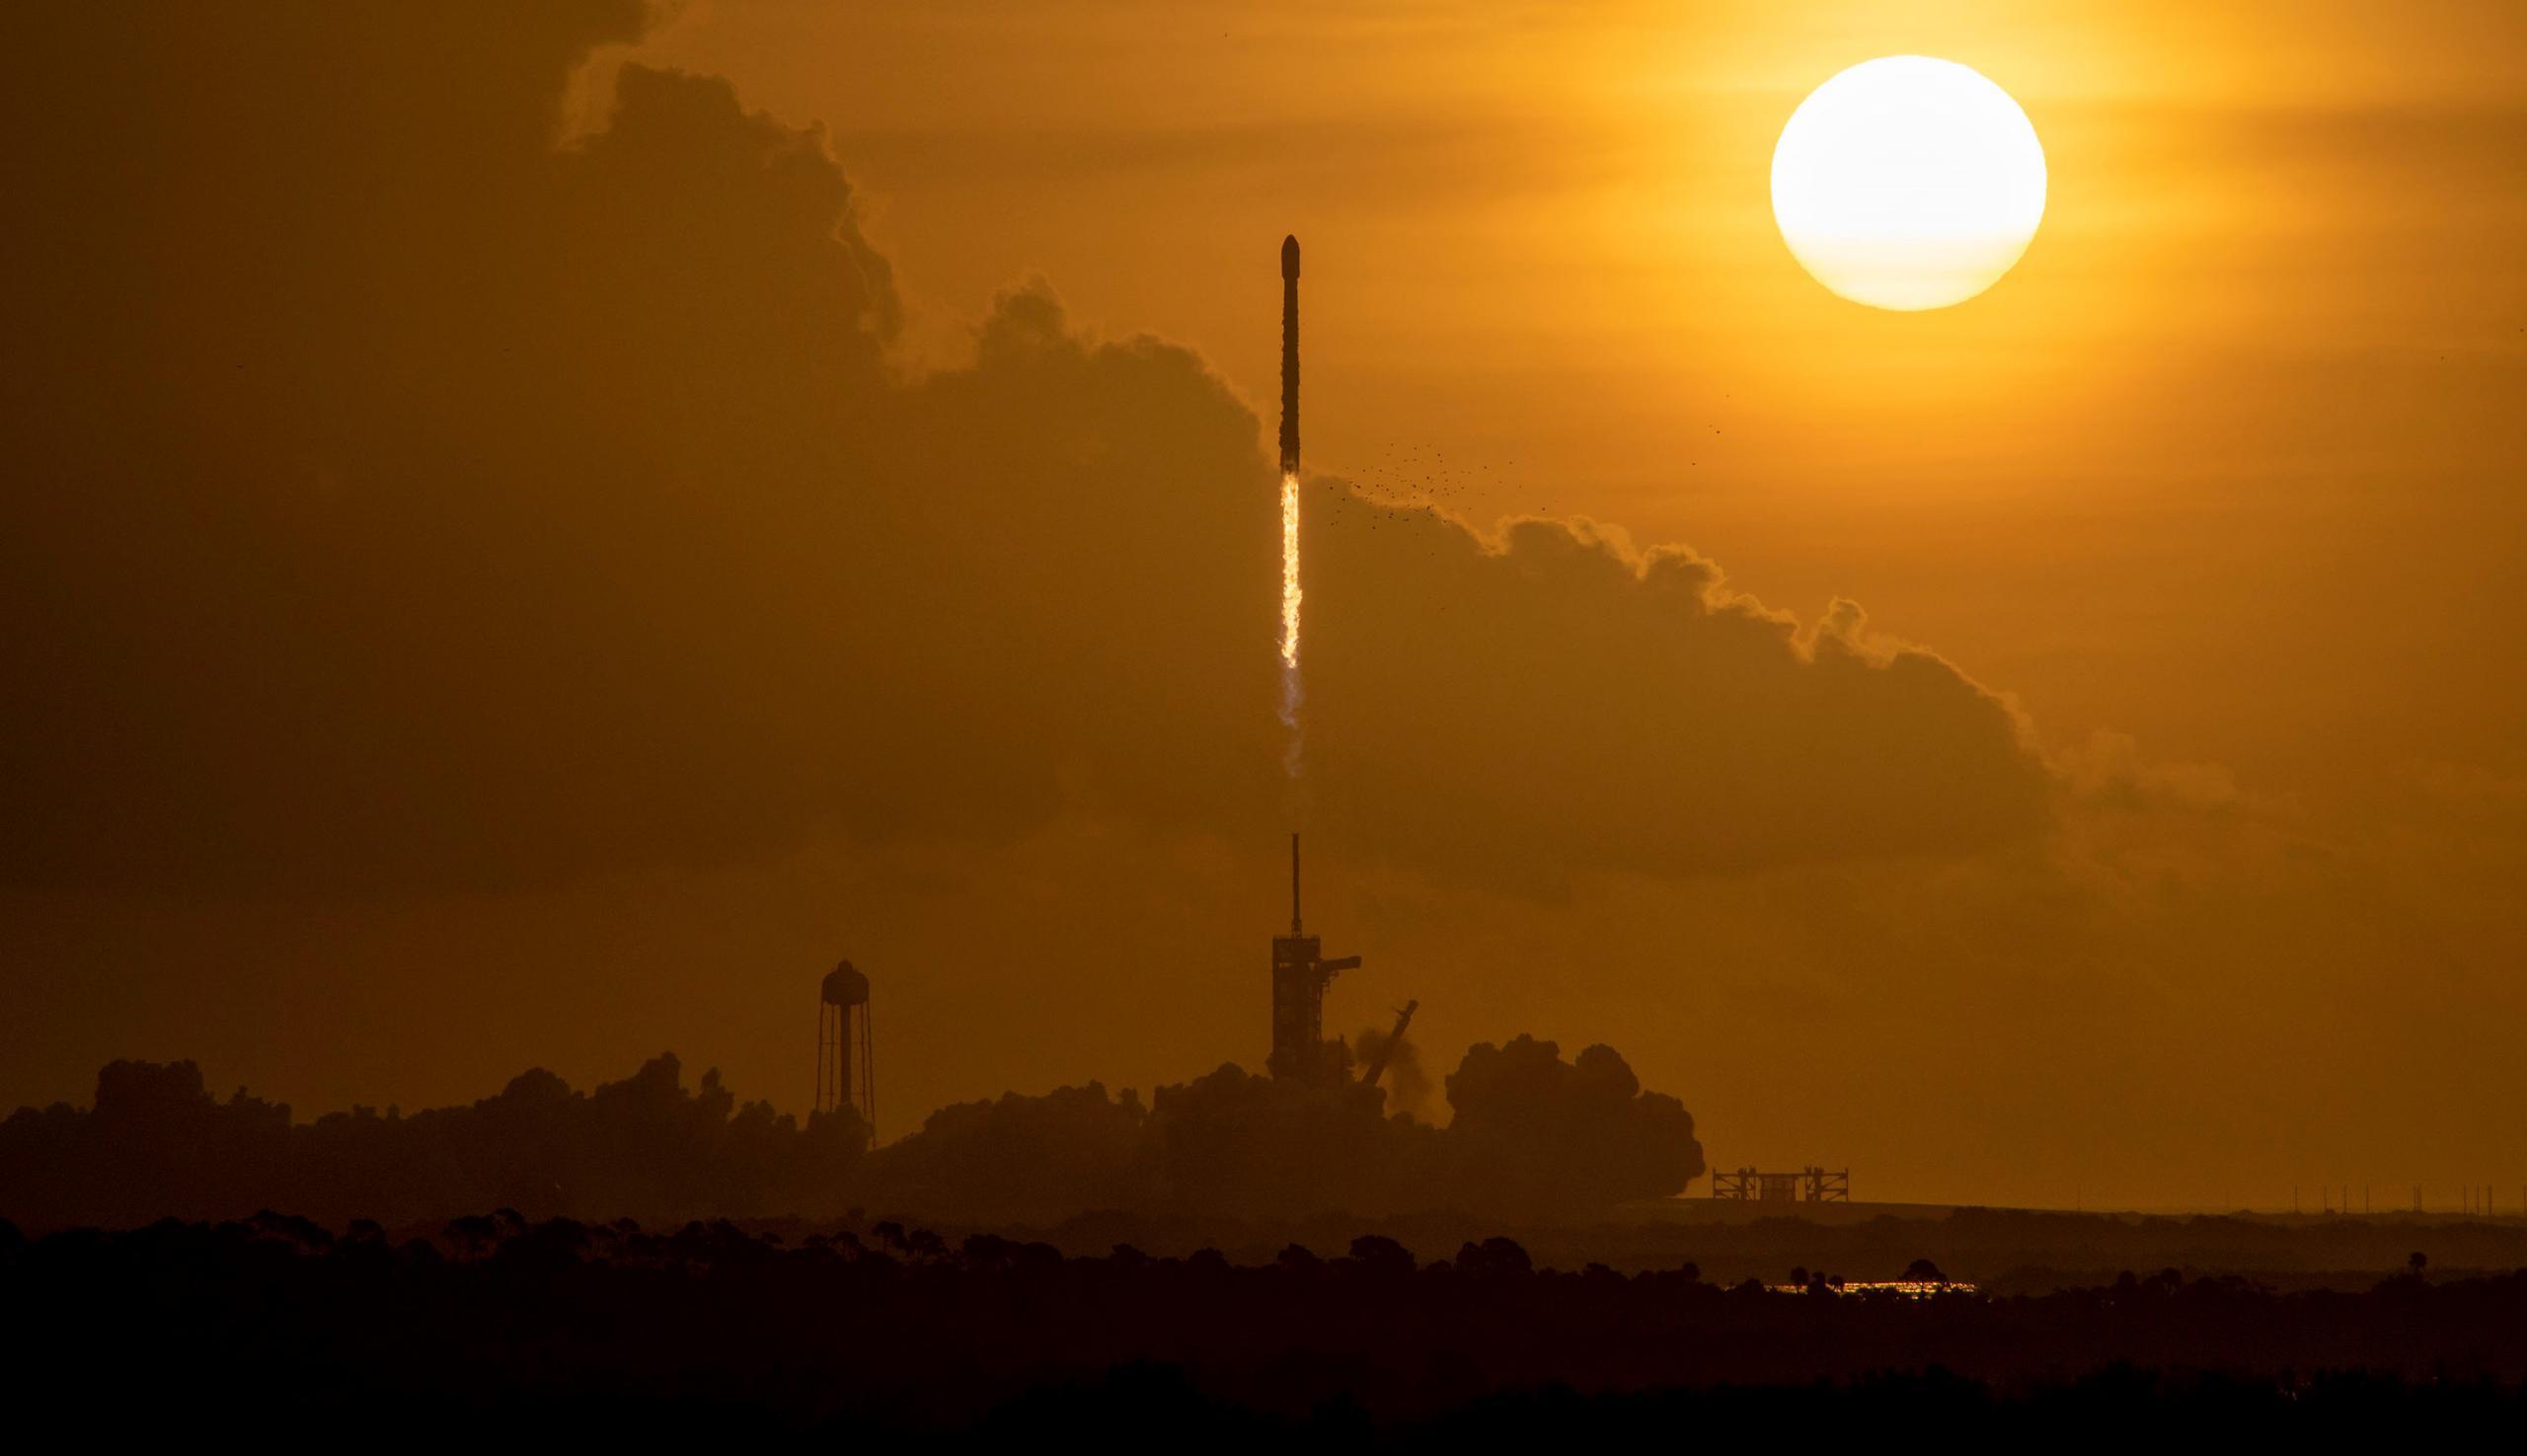 Starlink-12 F9 B1058 39A 100620 (SpaceX) 1 crop 1 (c)